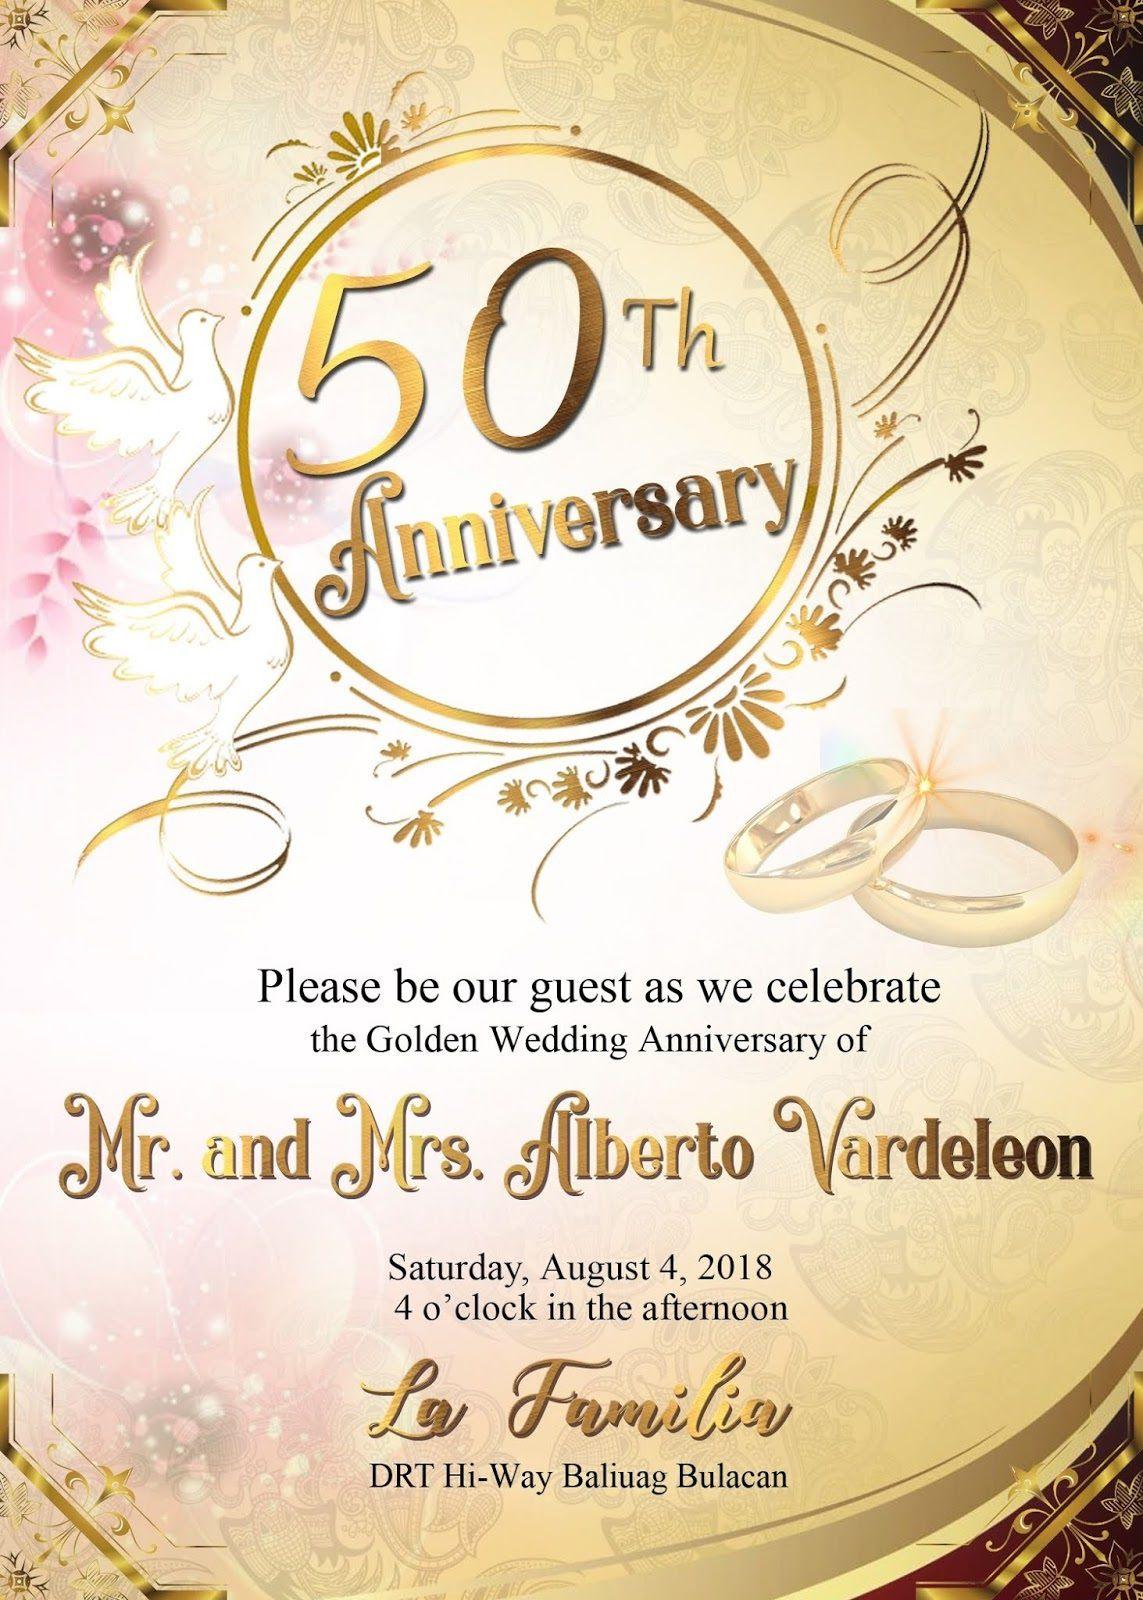 010 Stunning 50th Anniversary Party Invitation Template Example  Templates Golden Wedding Uk Microsoft Word FreeFull